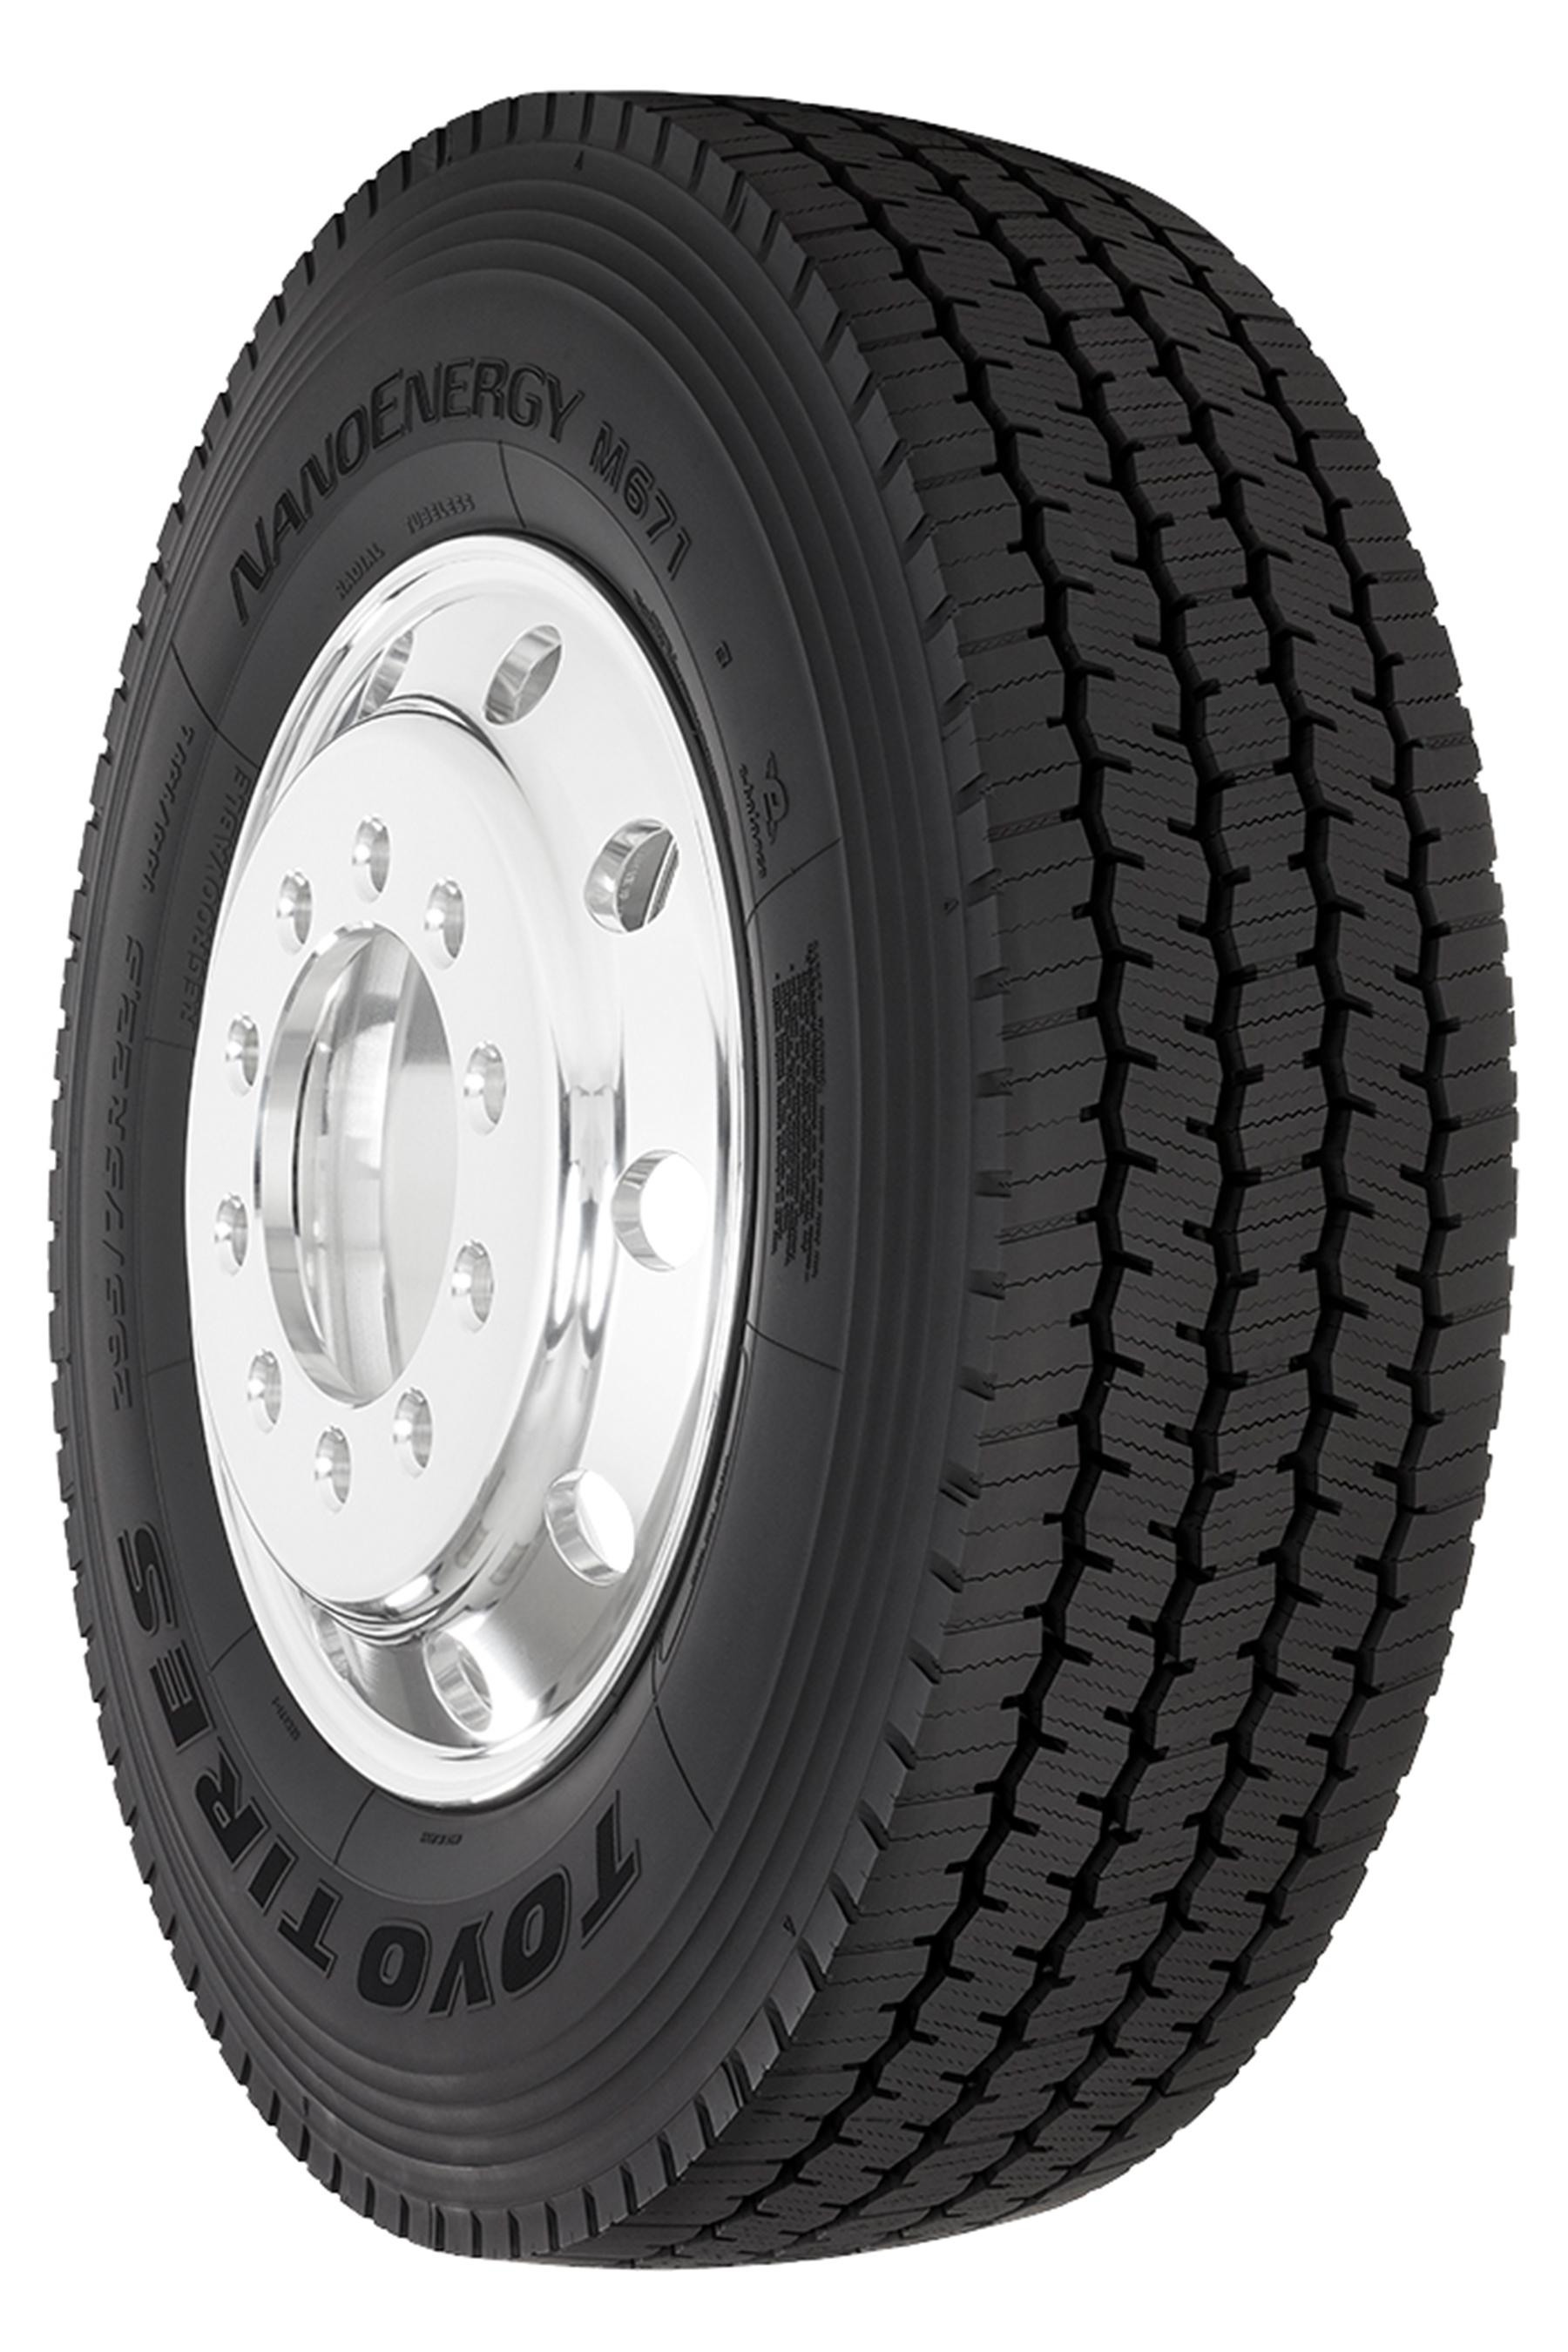 Toyo Launches Super-Regional Drive Tire